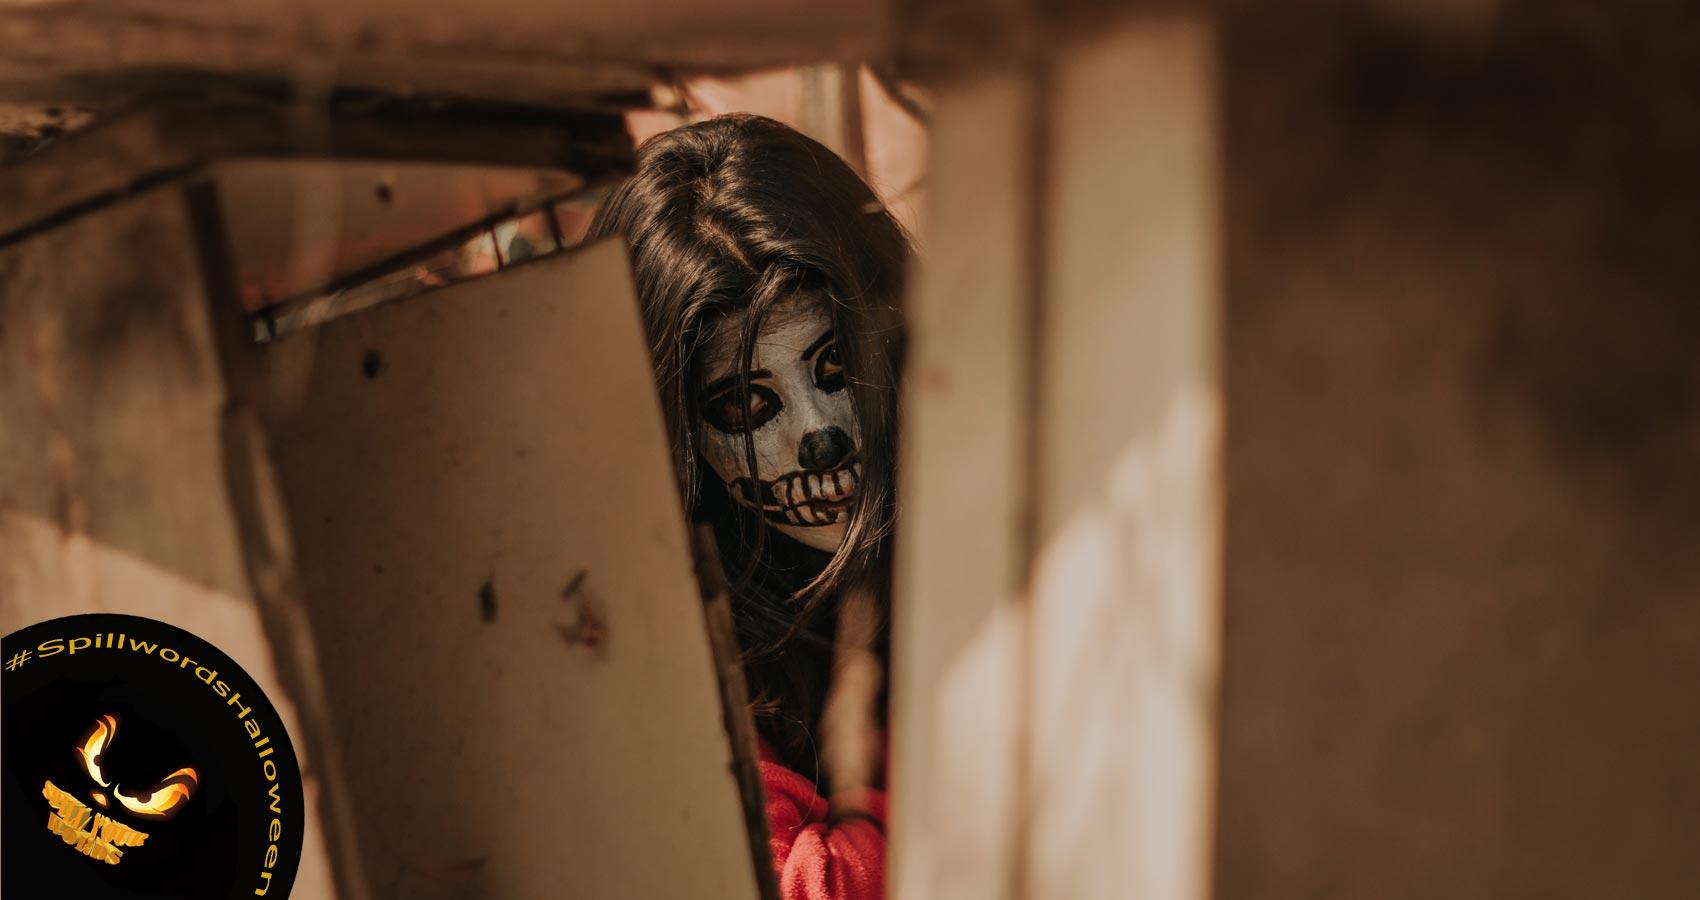 Halloween Harvest, short story by Carmen Baca at Spillwords.com